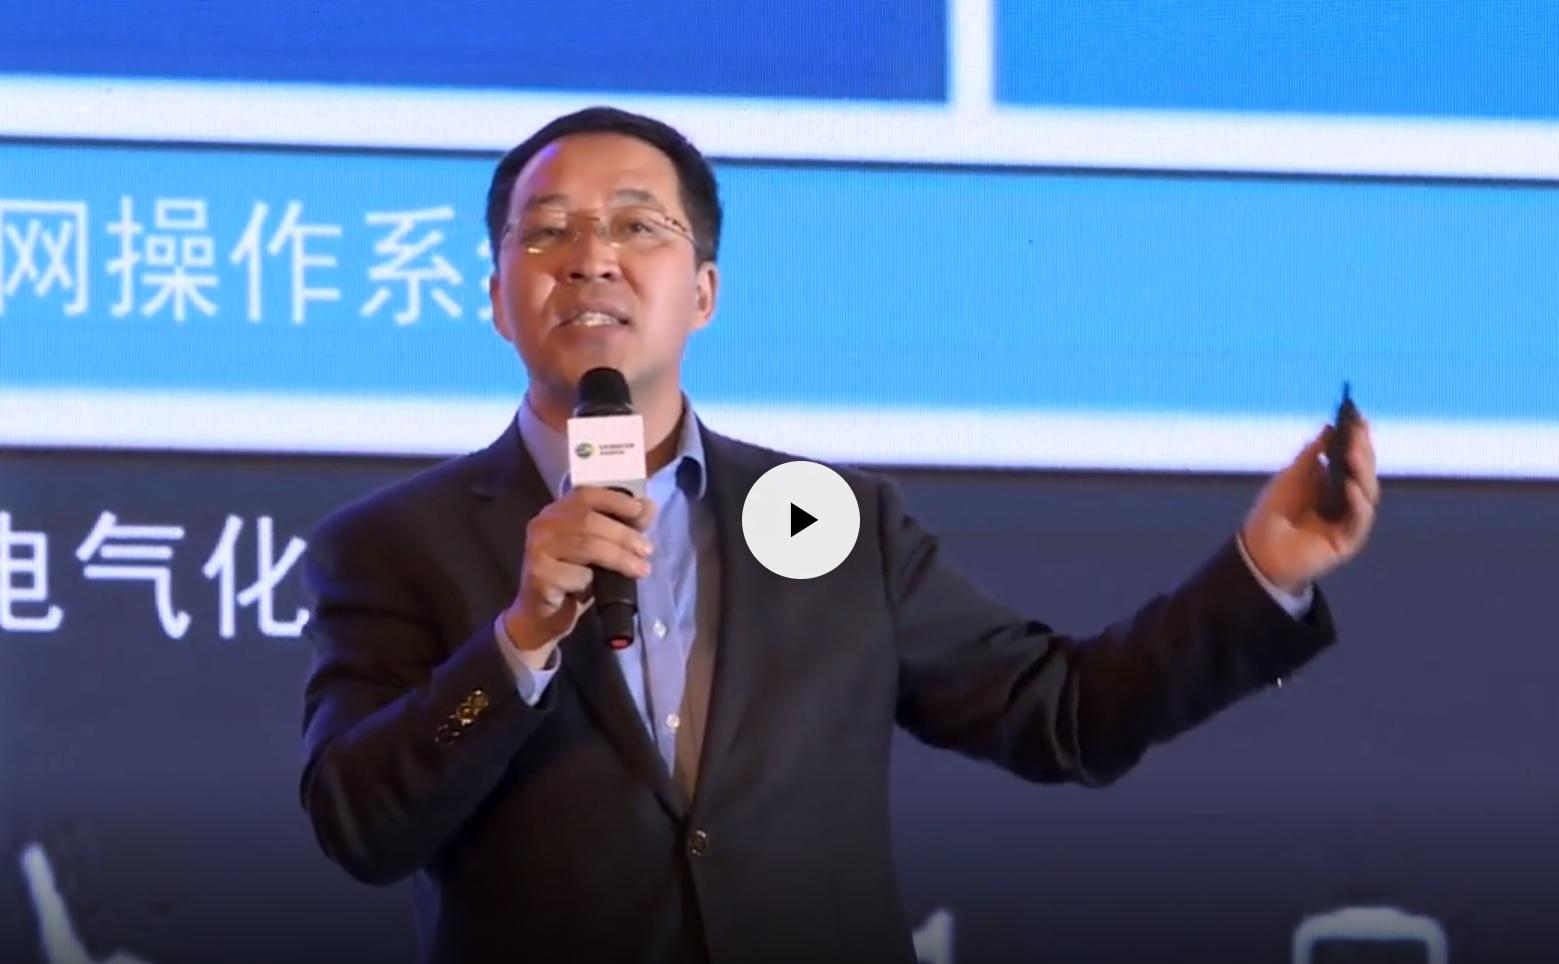 IDC中国区副总裁武连峰在深信服2018创新论坛做出分享